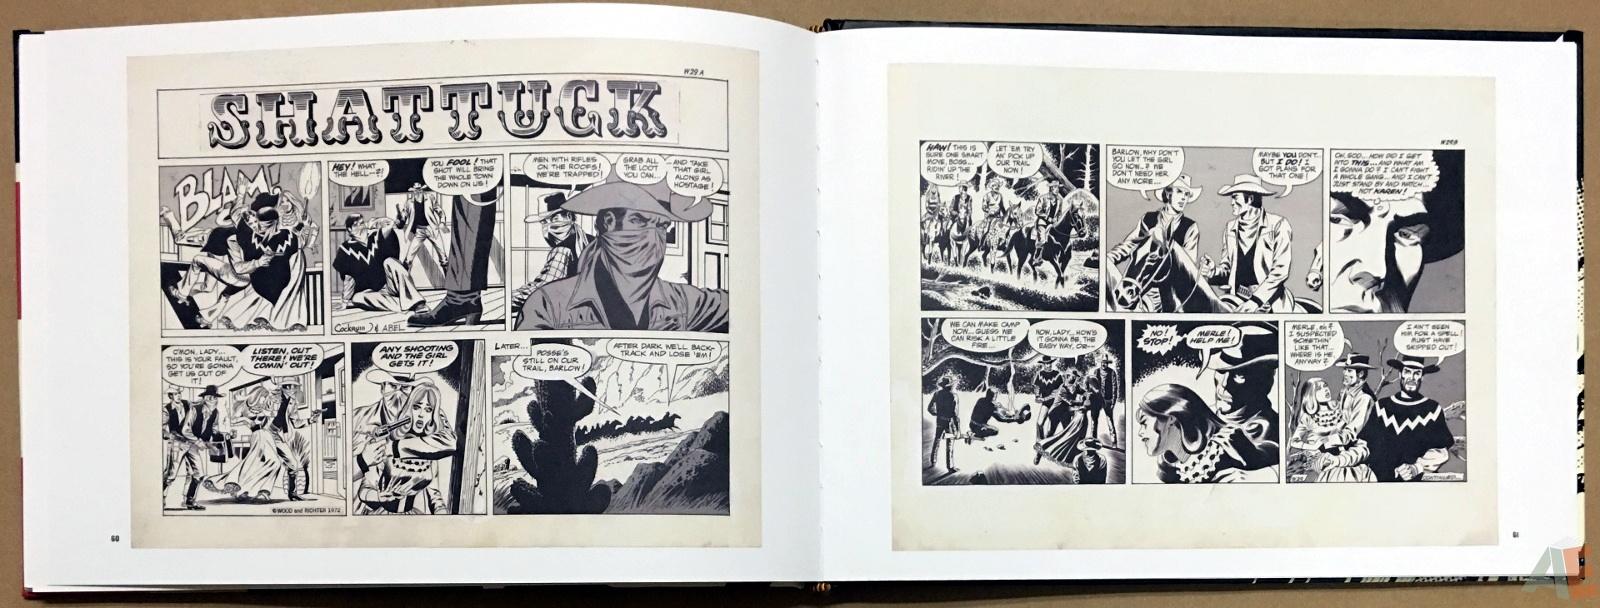 Wallace Wood Presents Shattuck Original Art Edition 22